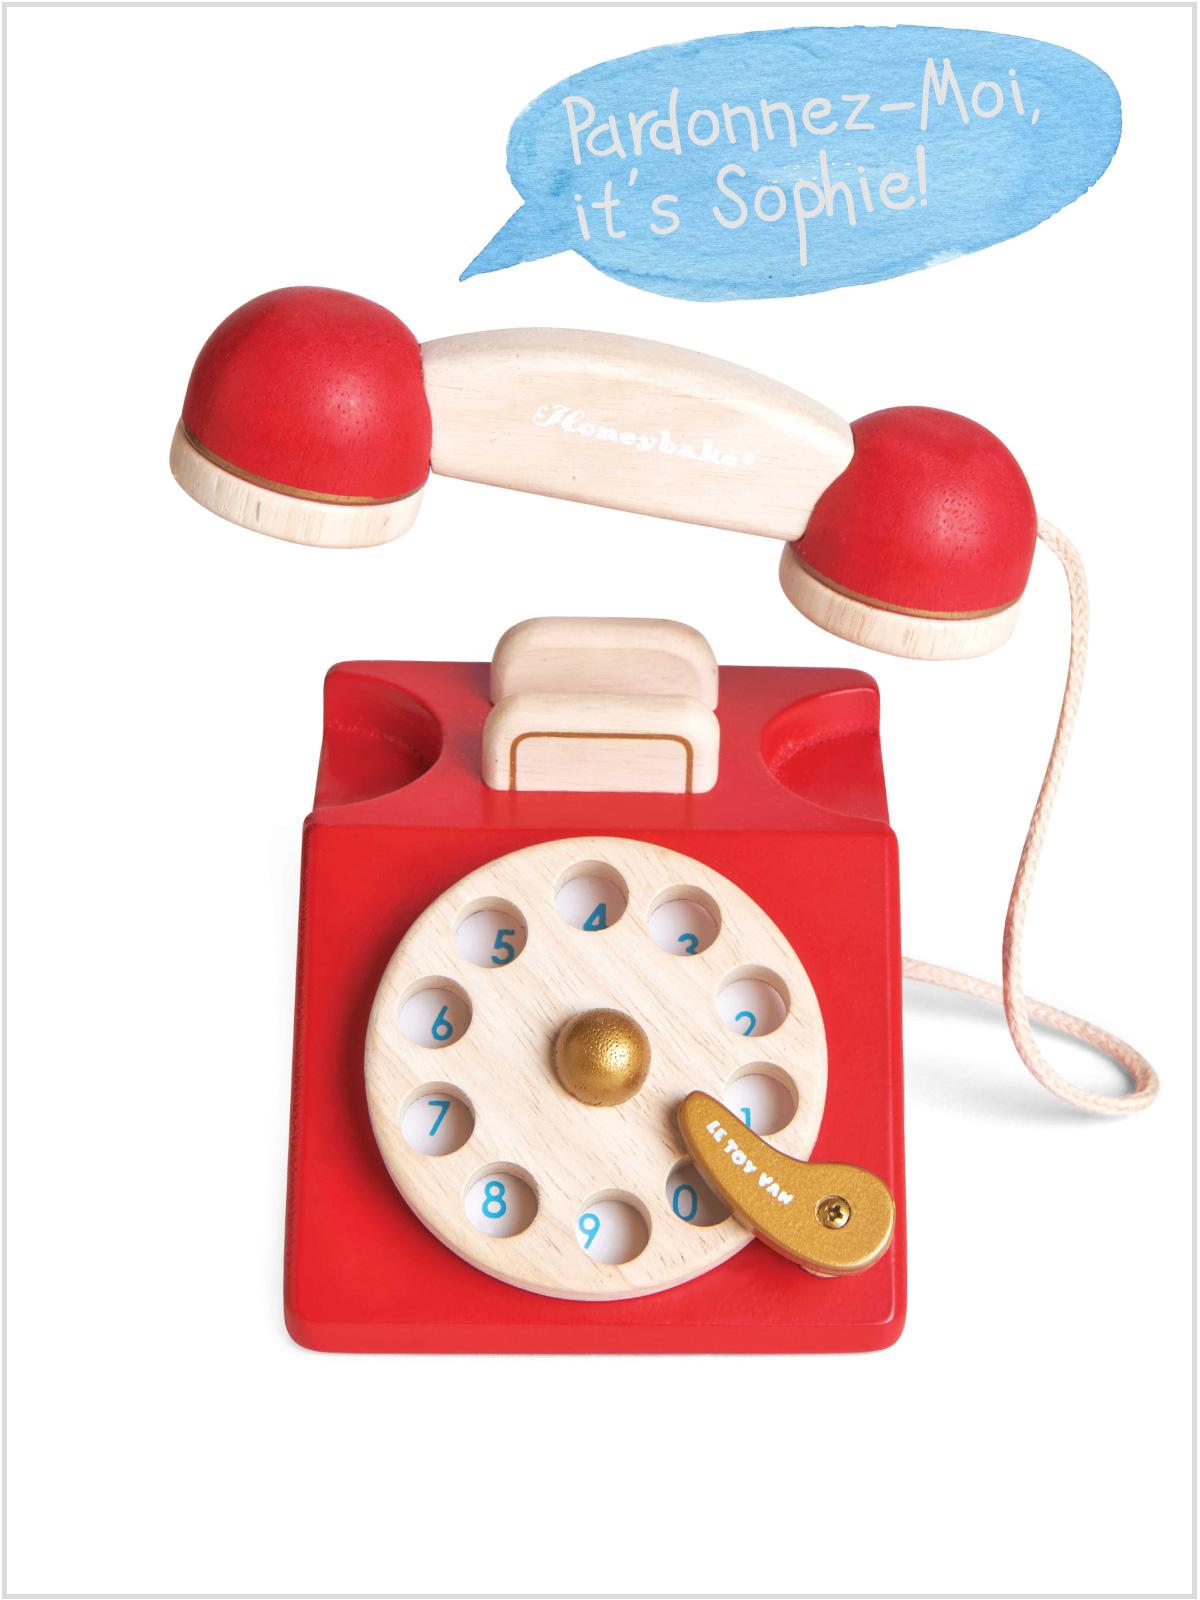 frederickandsophie-kids-toys-LeToyVan-wooden-phone-